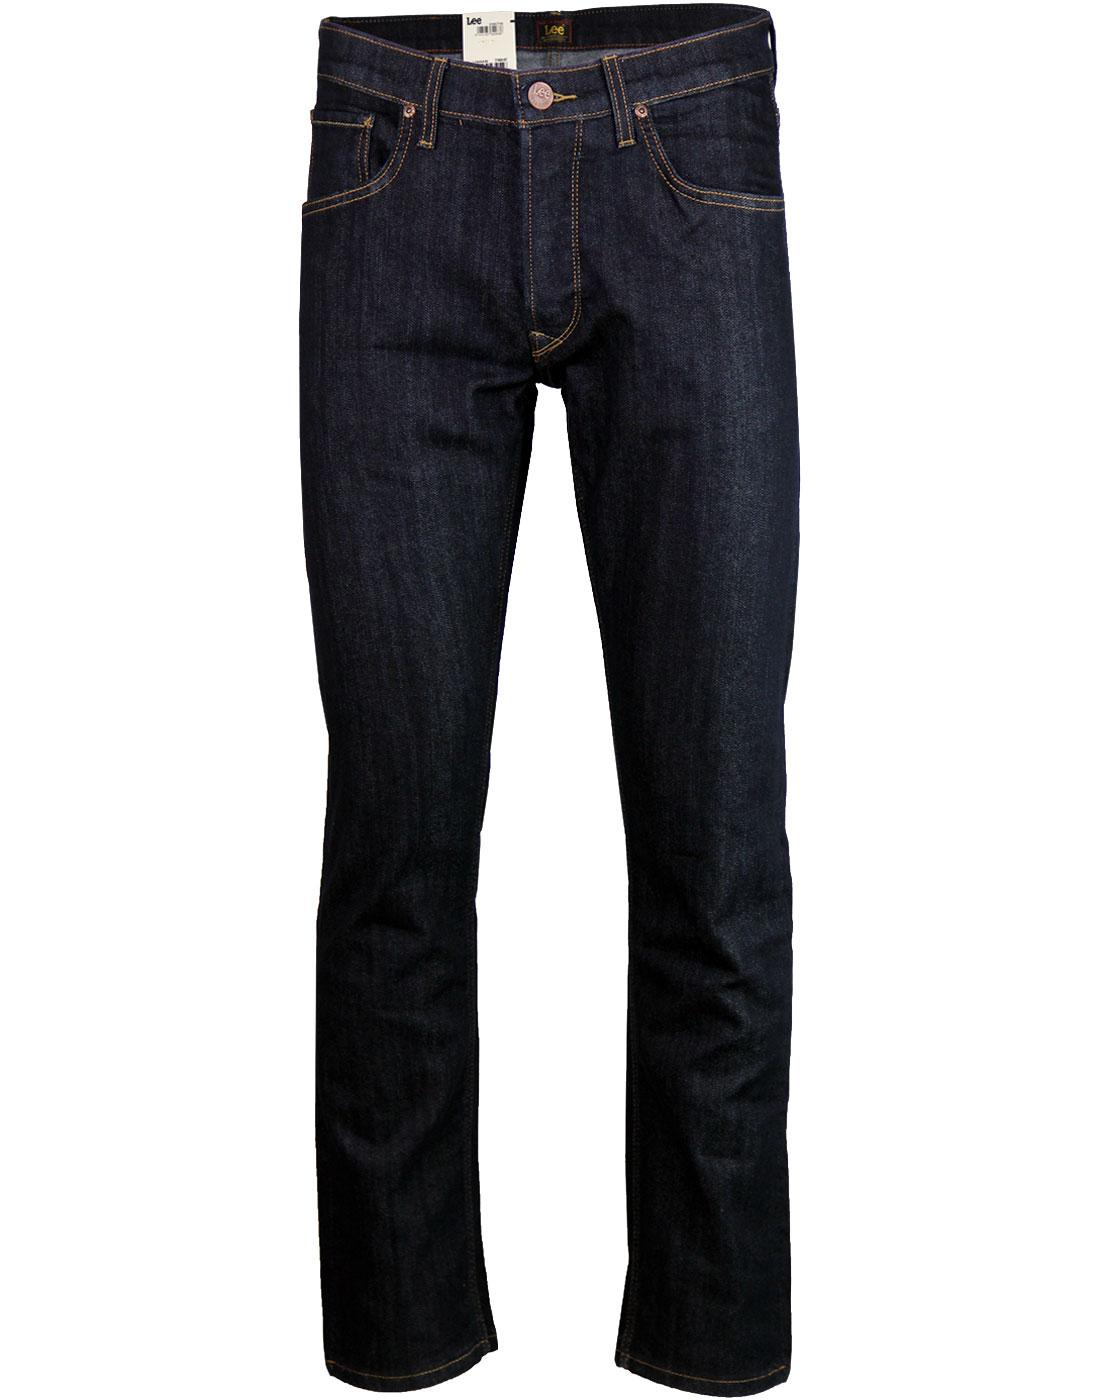 Daren LEE Jeans Retro Regular Slim Denim Jeans R